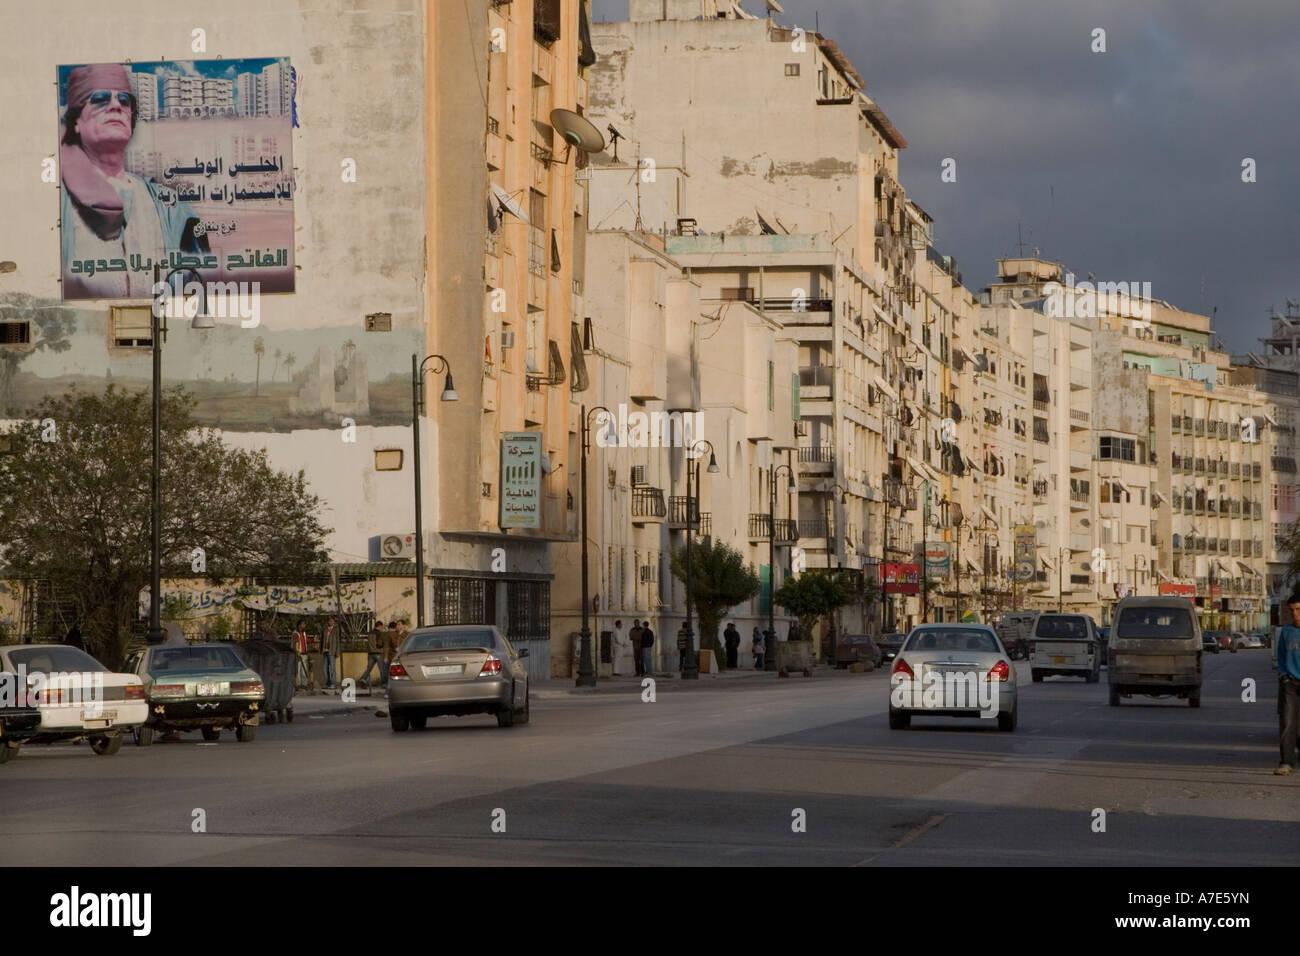 Benghazi, Libya, North Africa. Gamal Abdul Nasser Street, Qadhafi Billboard Upper Left - Stock Image